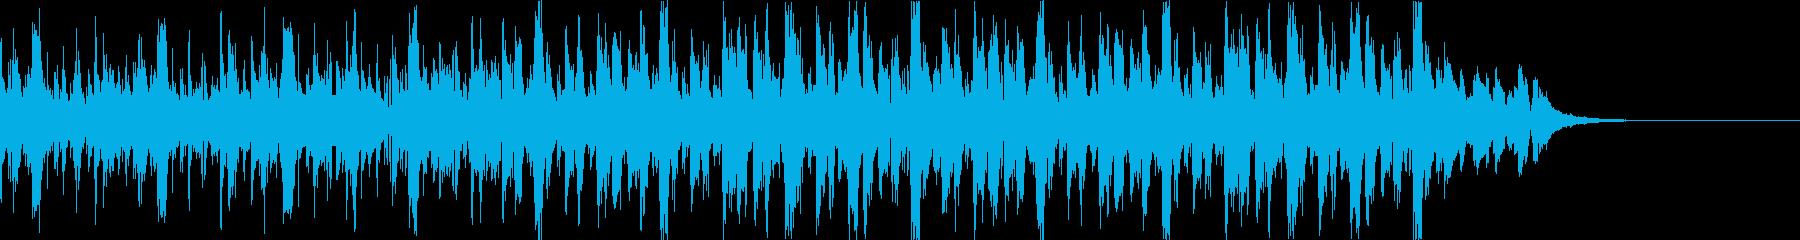 Pf「議案」和風現代ジャズの再生済みの波形